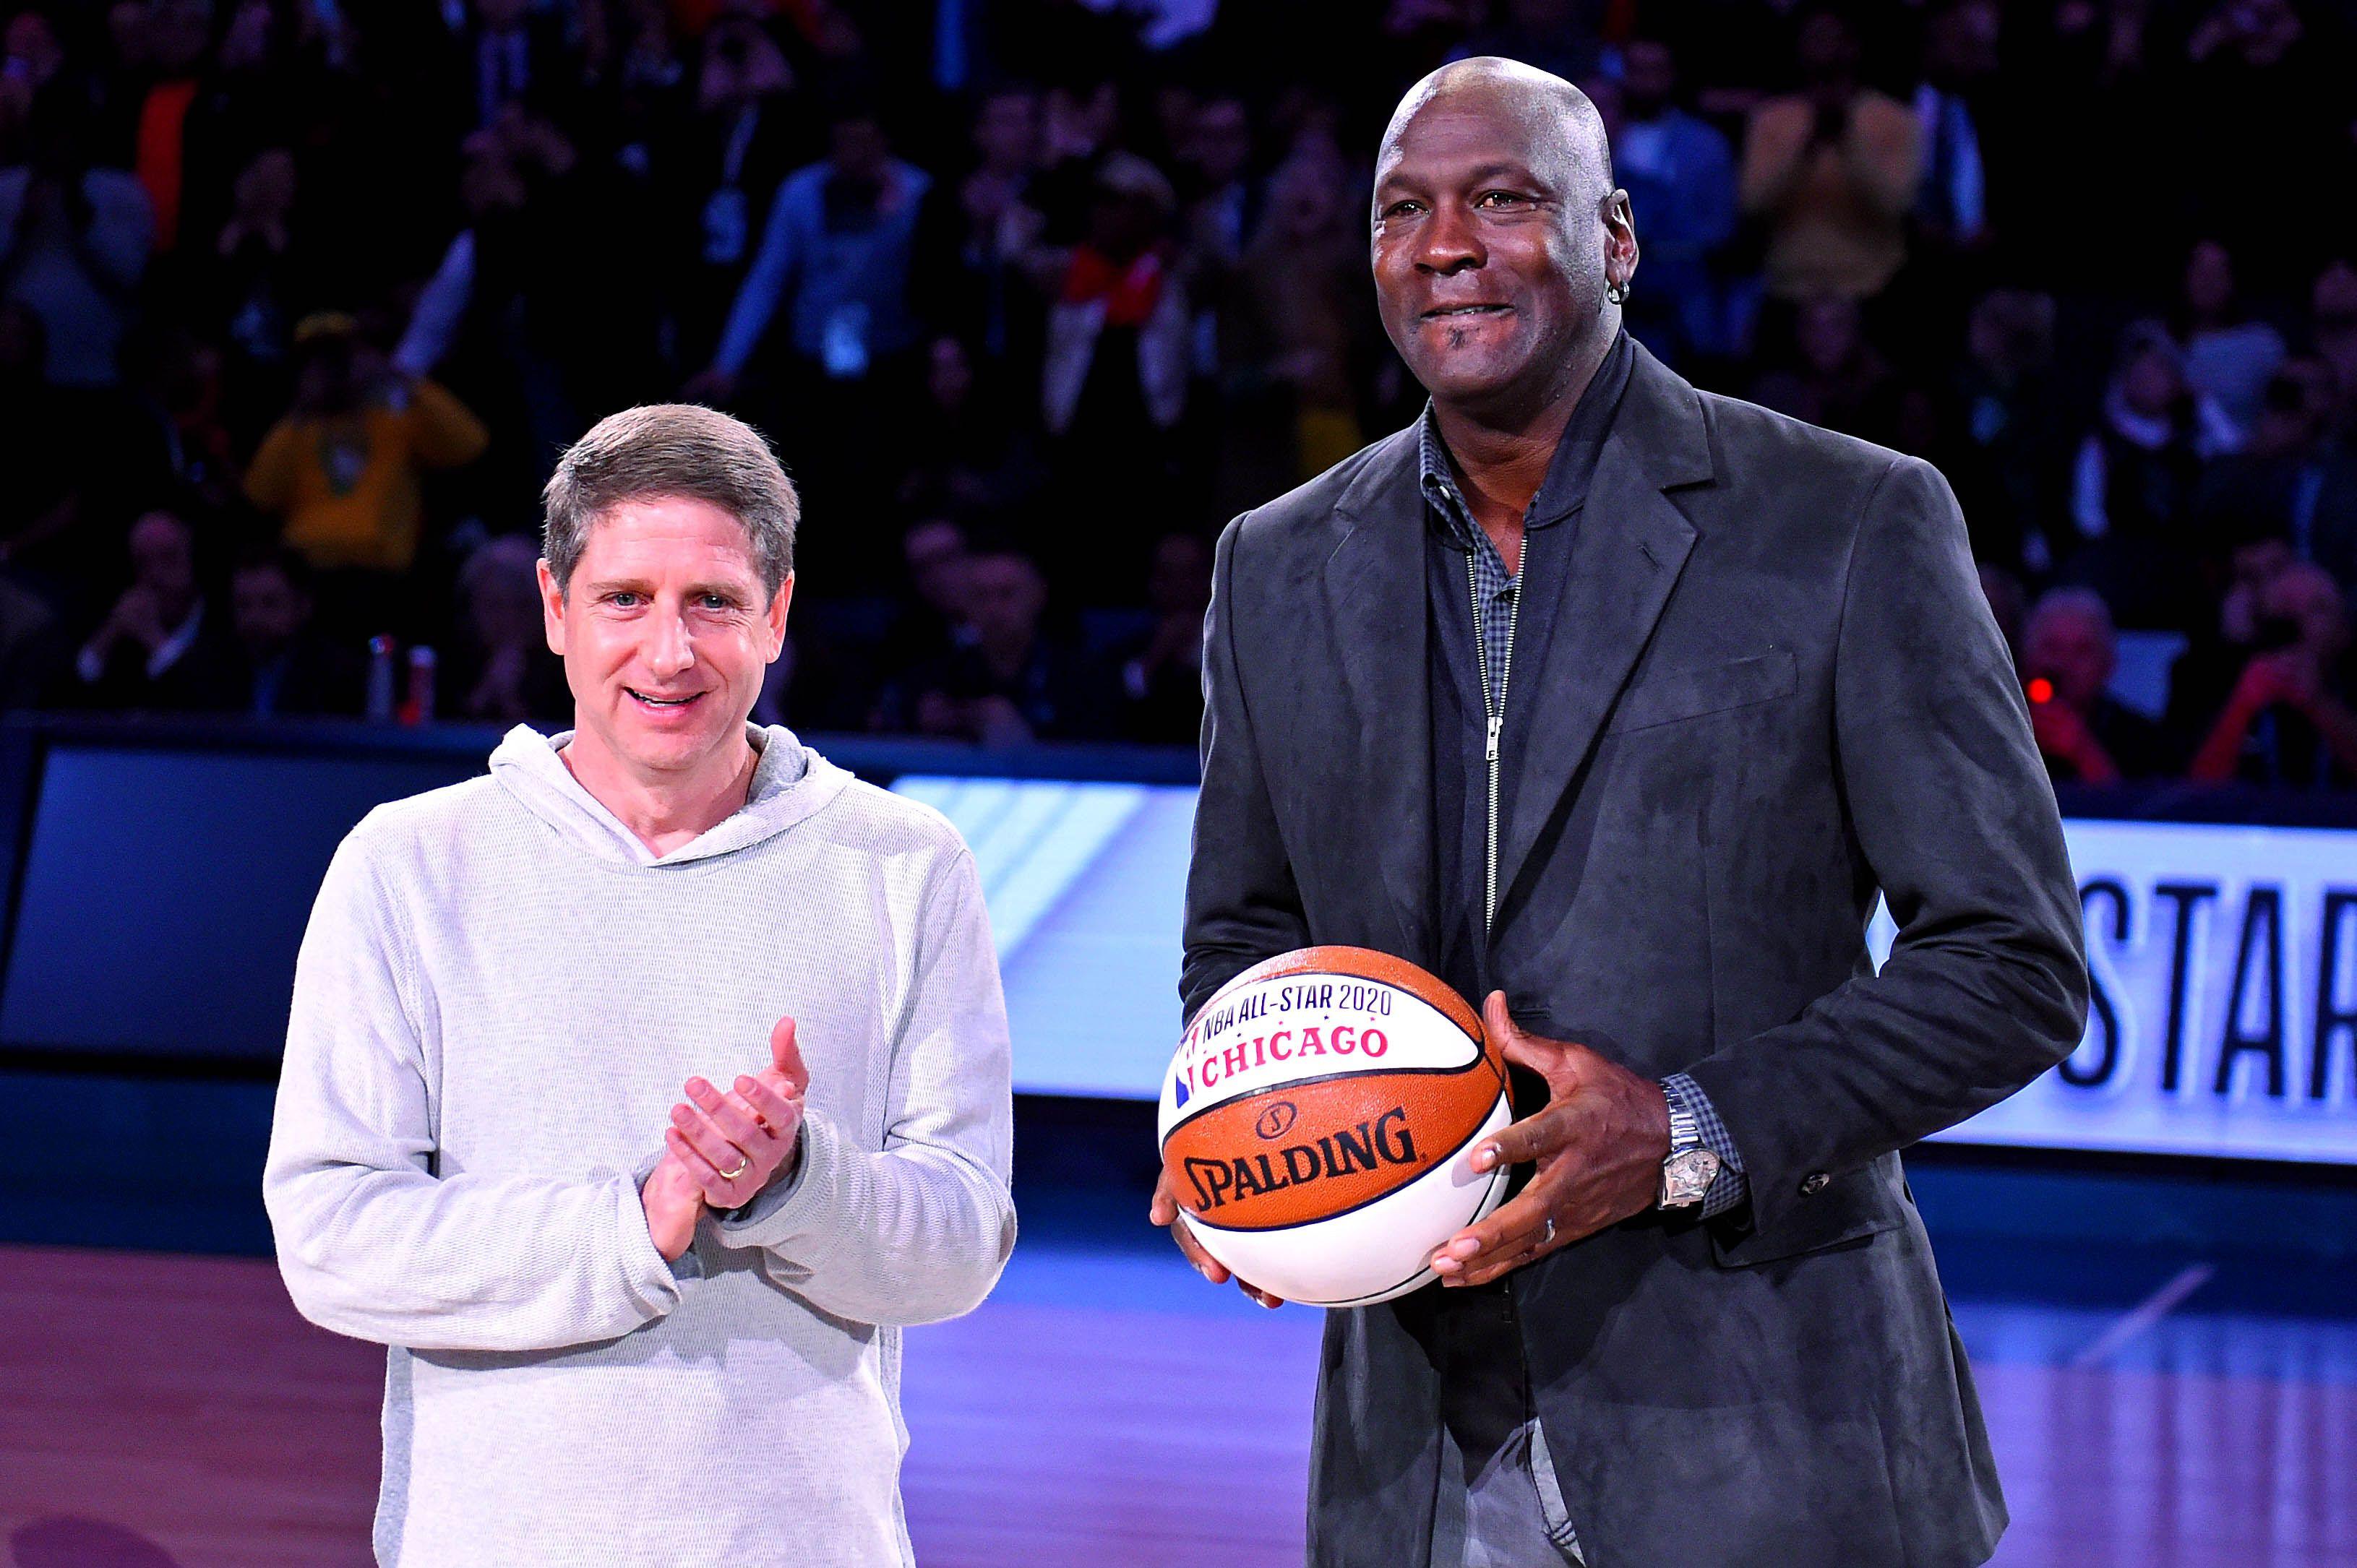 El ex basquetbolista continúa ligado a la NBA al ser dueño de la franquicia de Charlotte